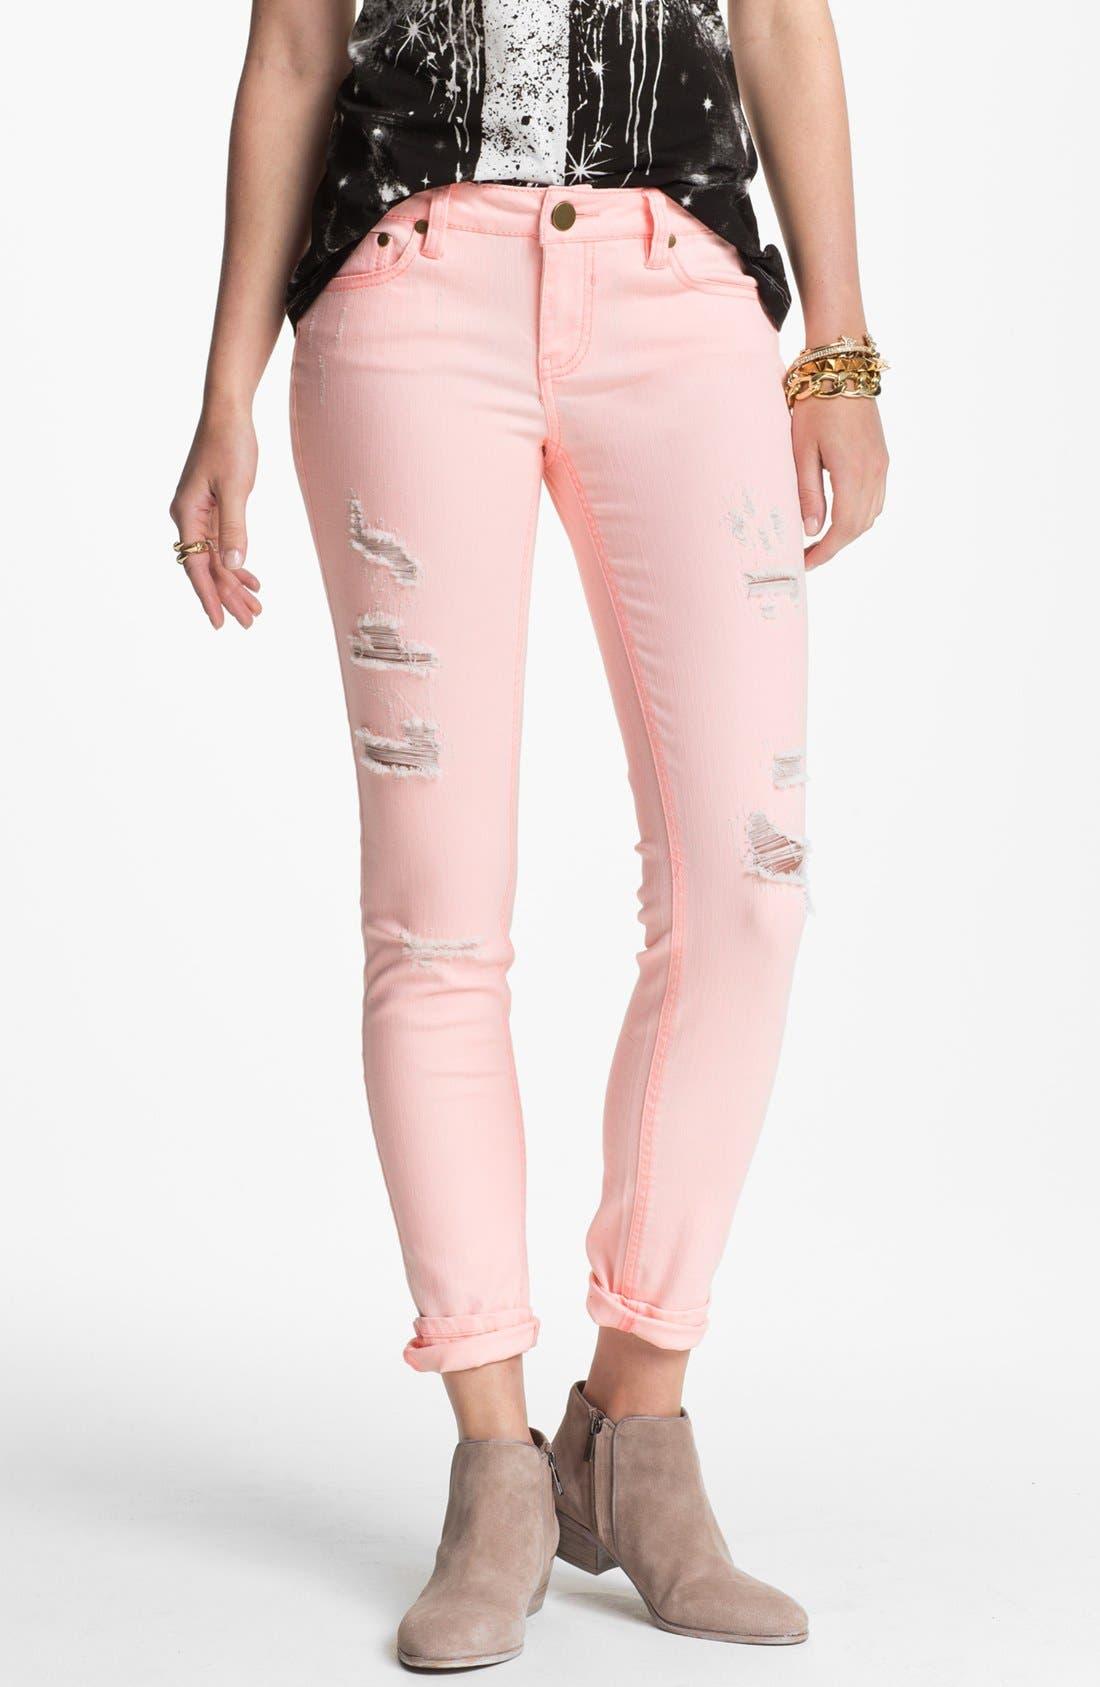 Main Image - Fire Destroyed Pastel Denim Skinny Jeans (Juniors) (Online Only)